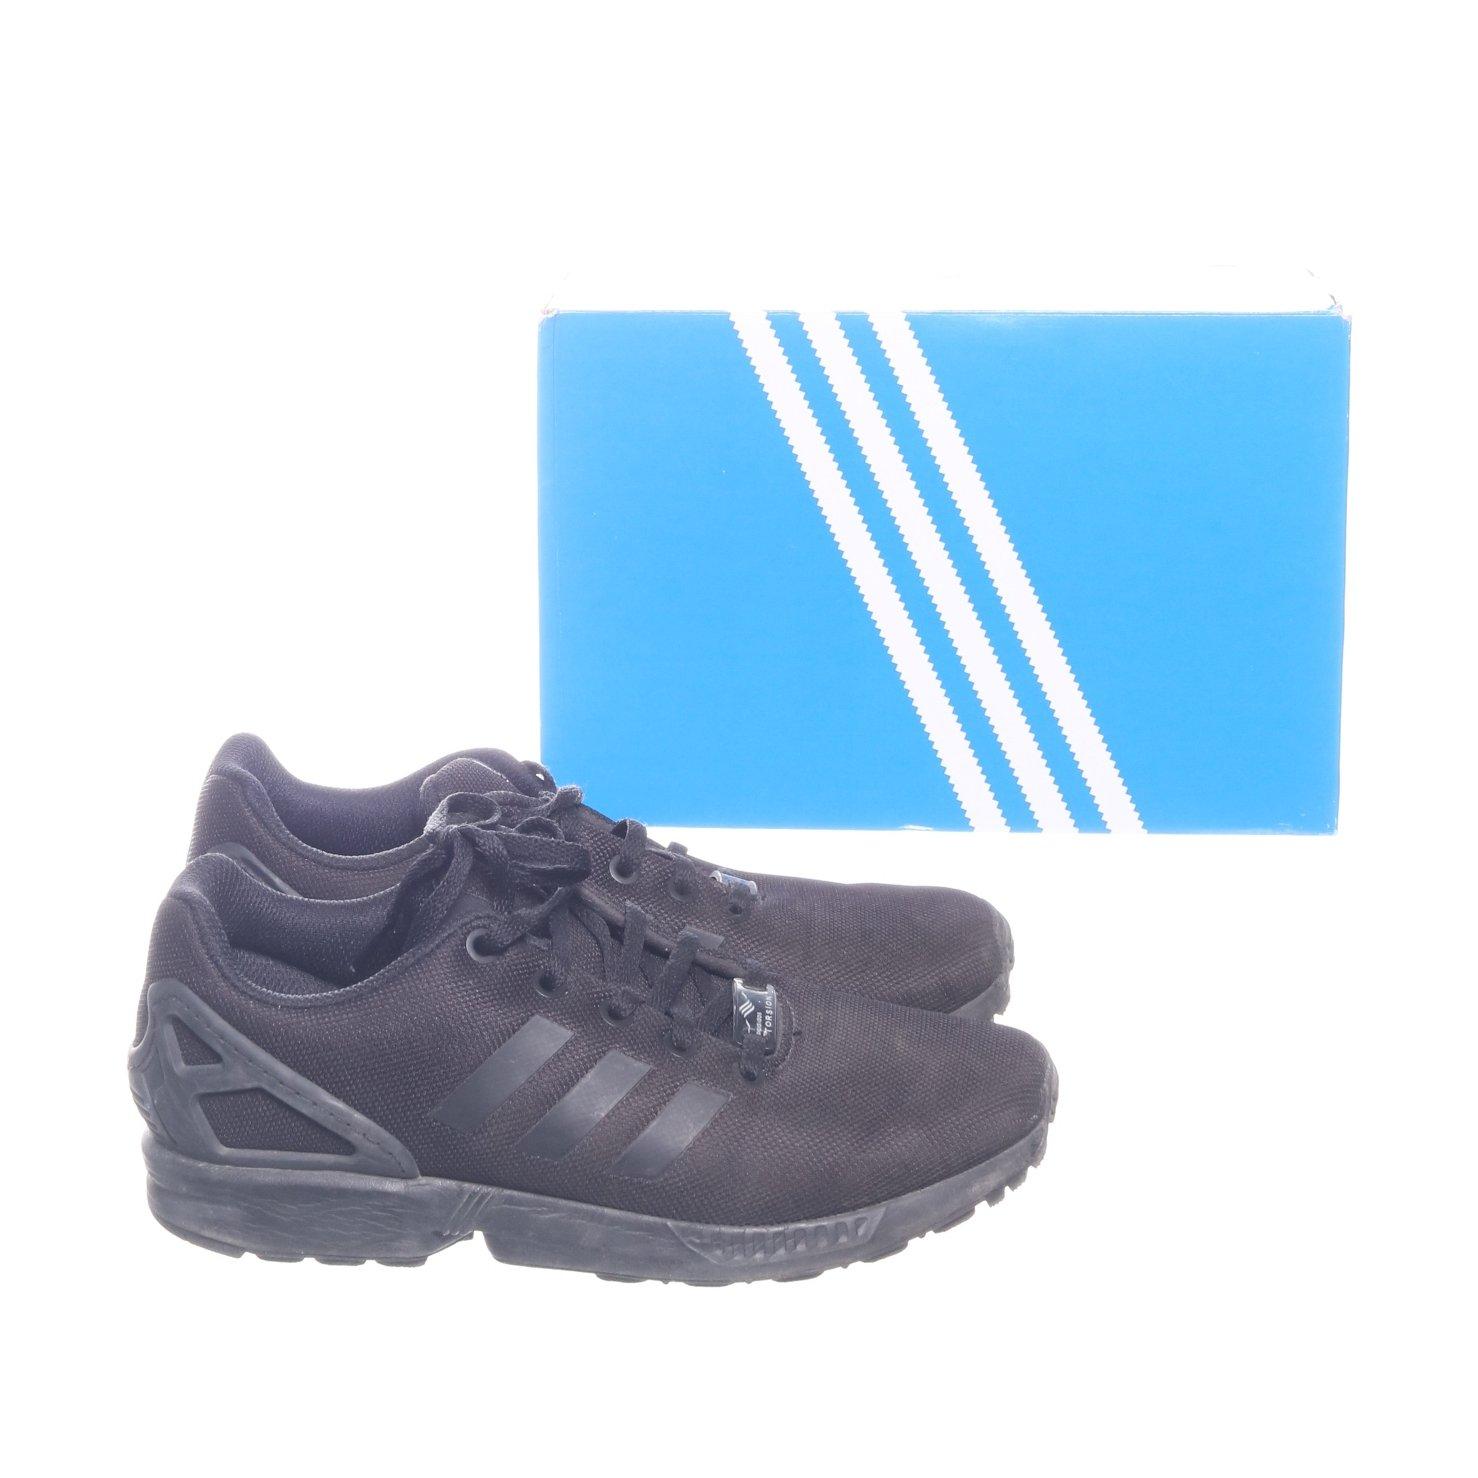 Adidas, Sneakers, Strl: 37,5, Adidas Tors.. (357851881) ?